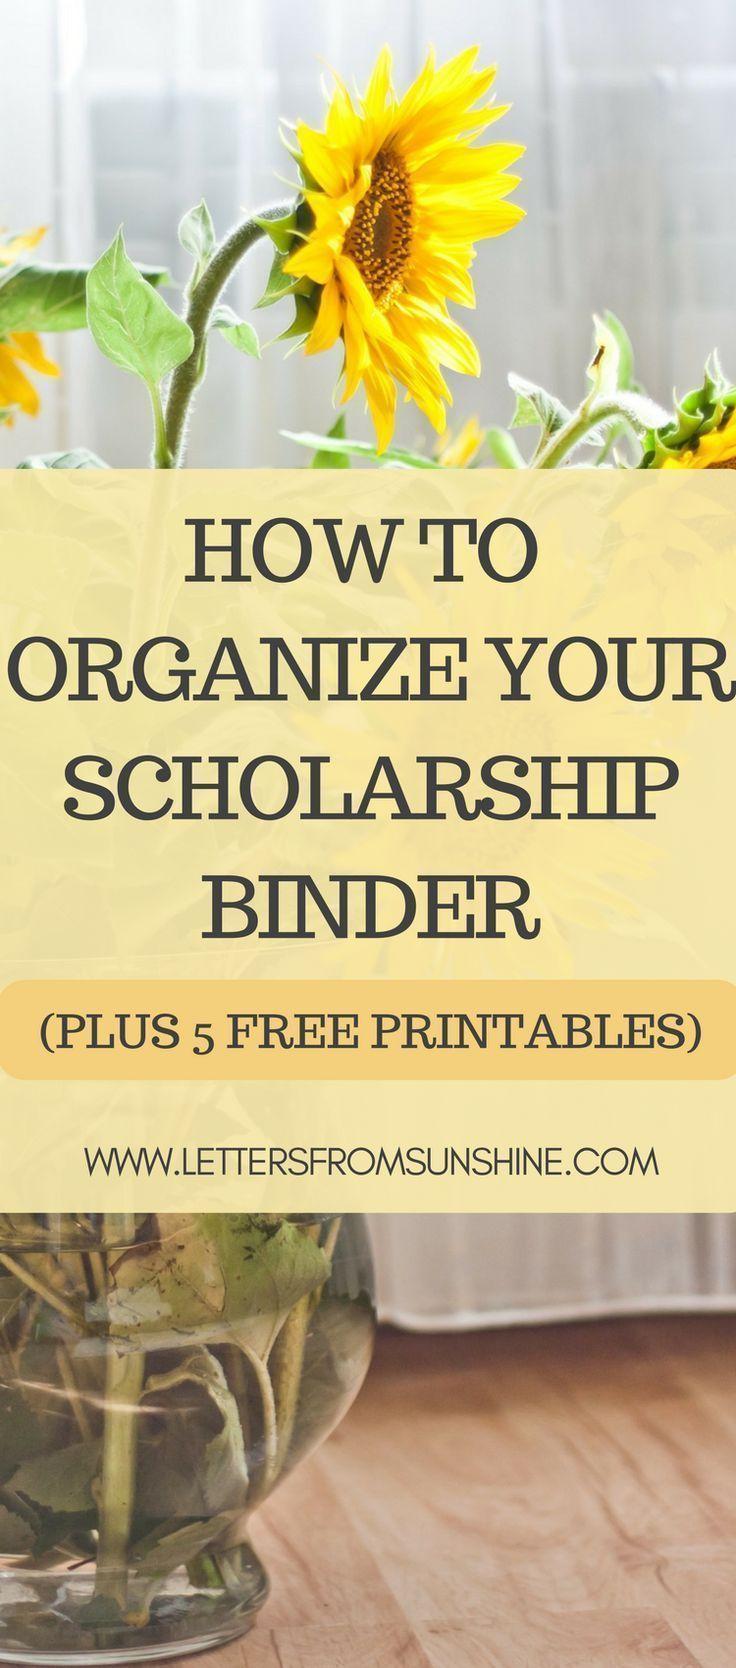 How to organize your scholarship binder school